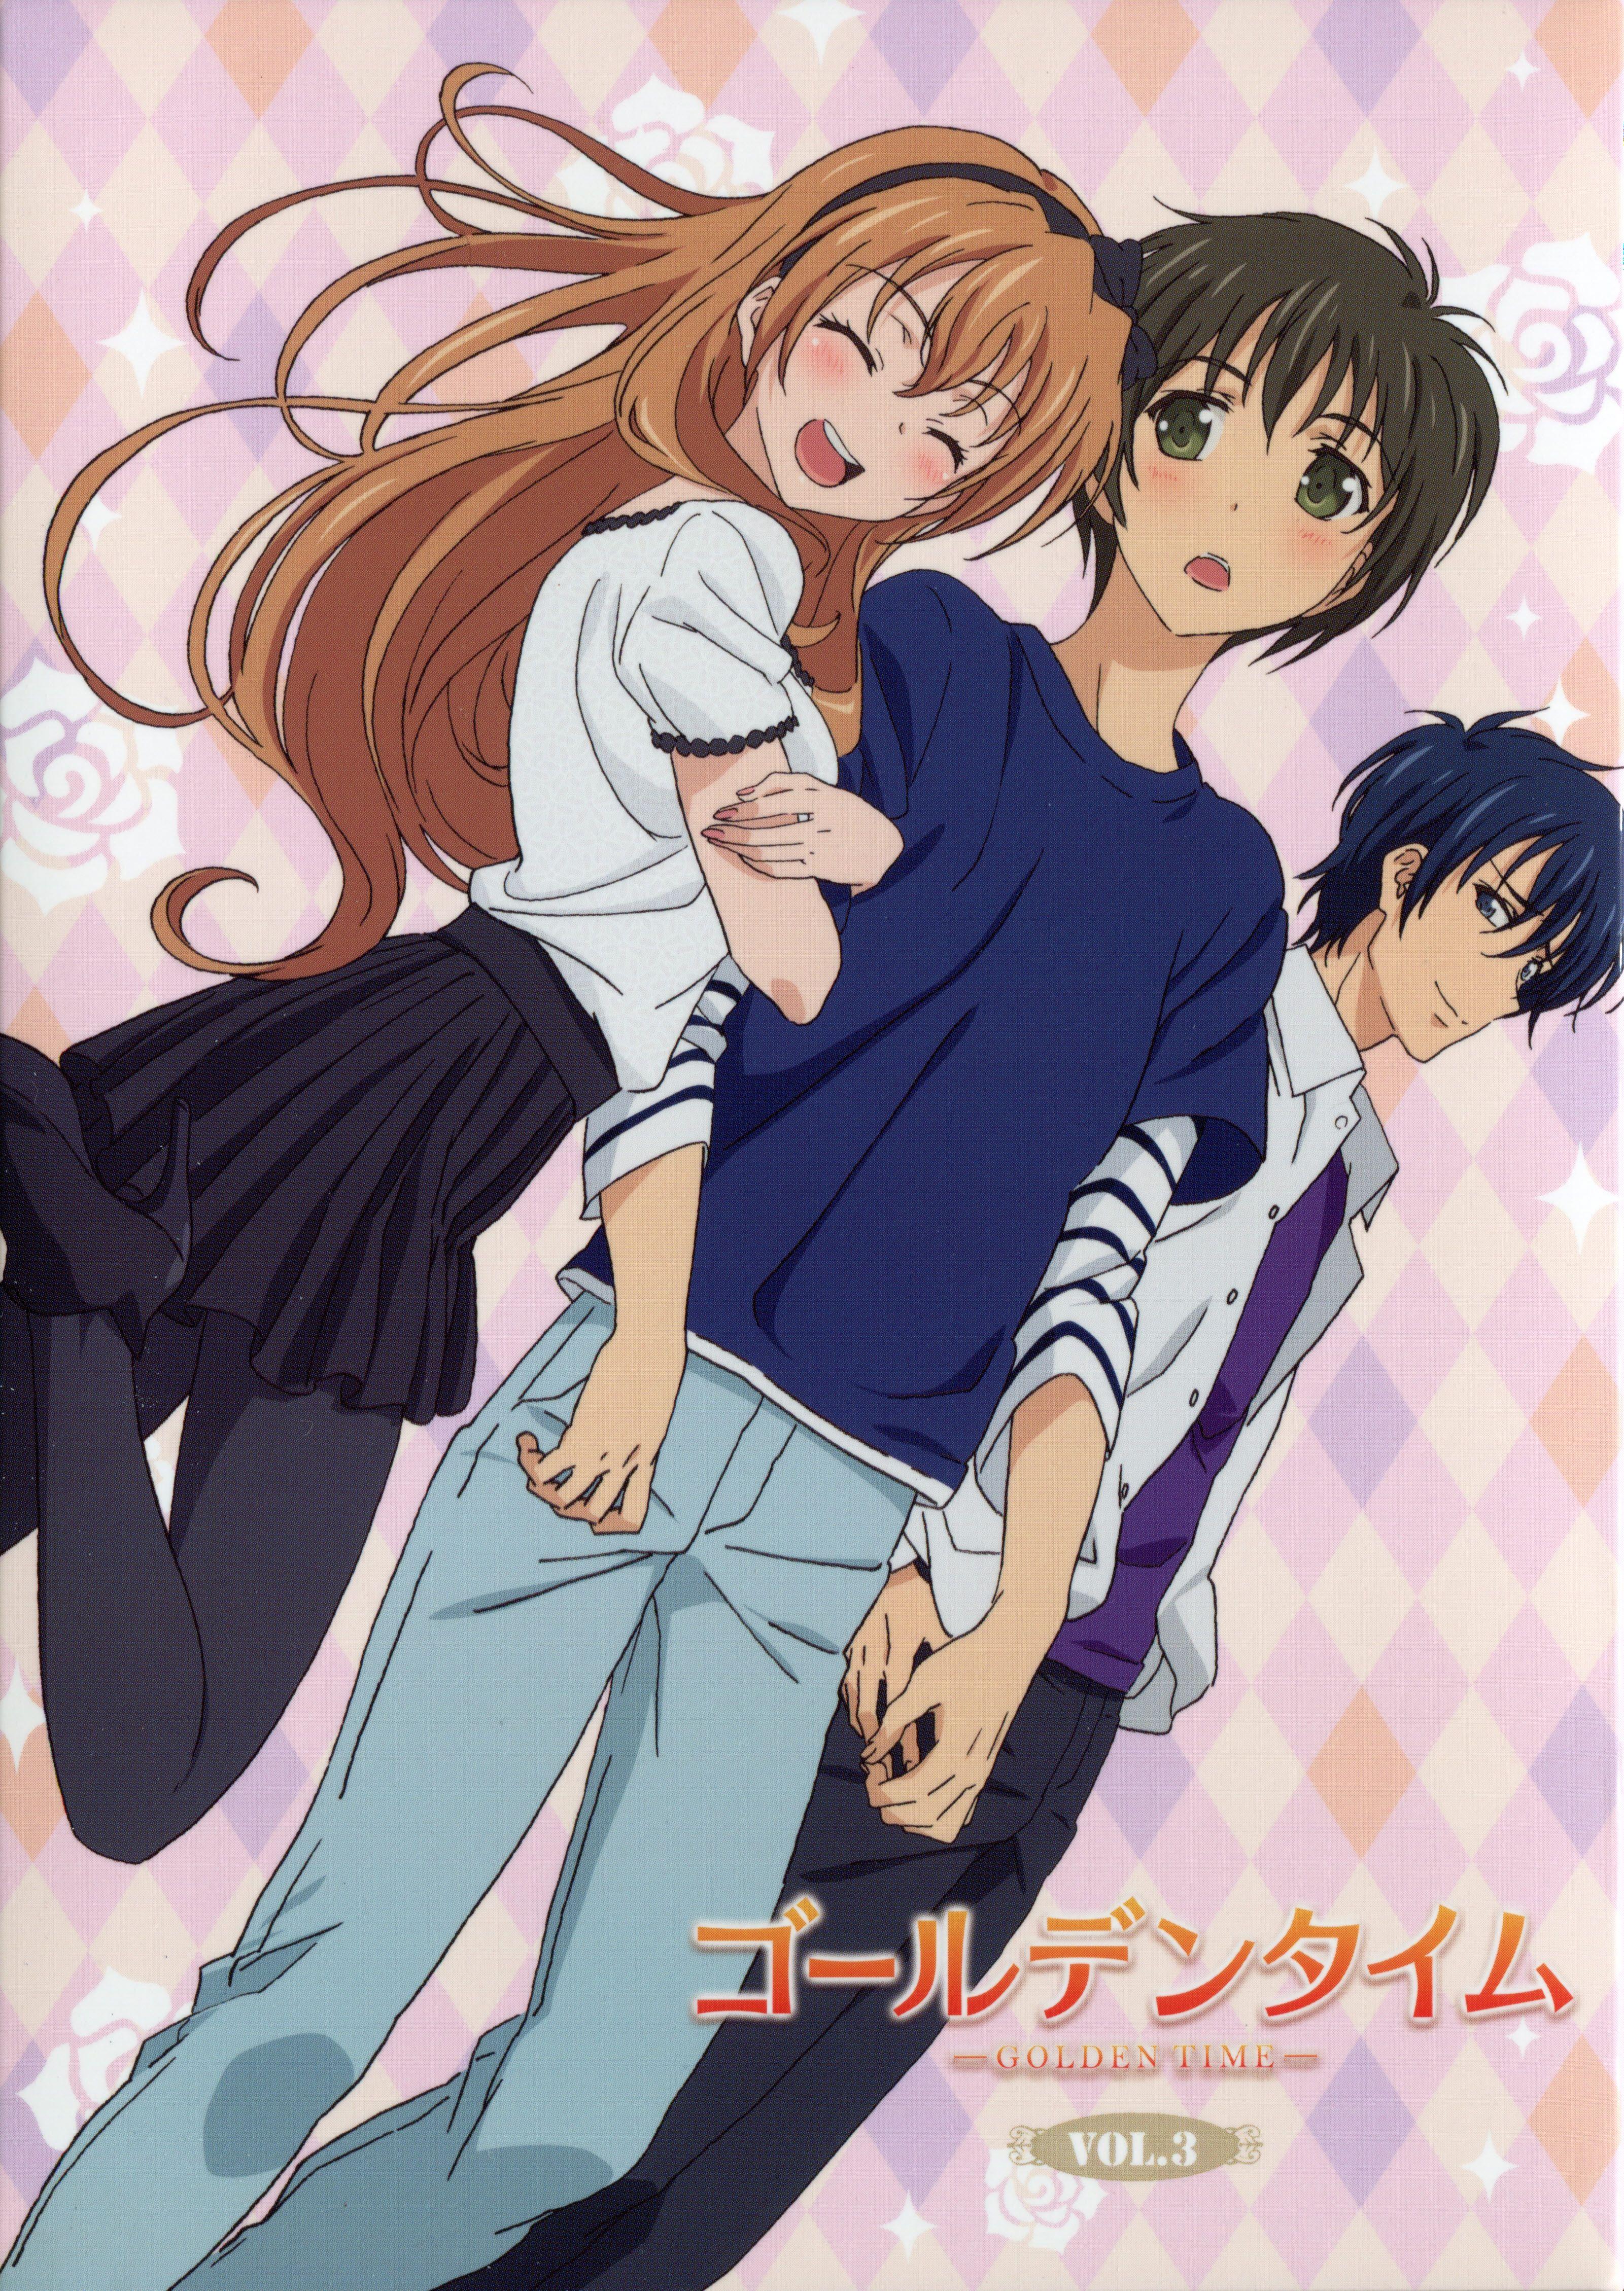 Download Golden Time (3201x4516) - Minitokyo | Anime